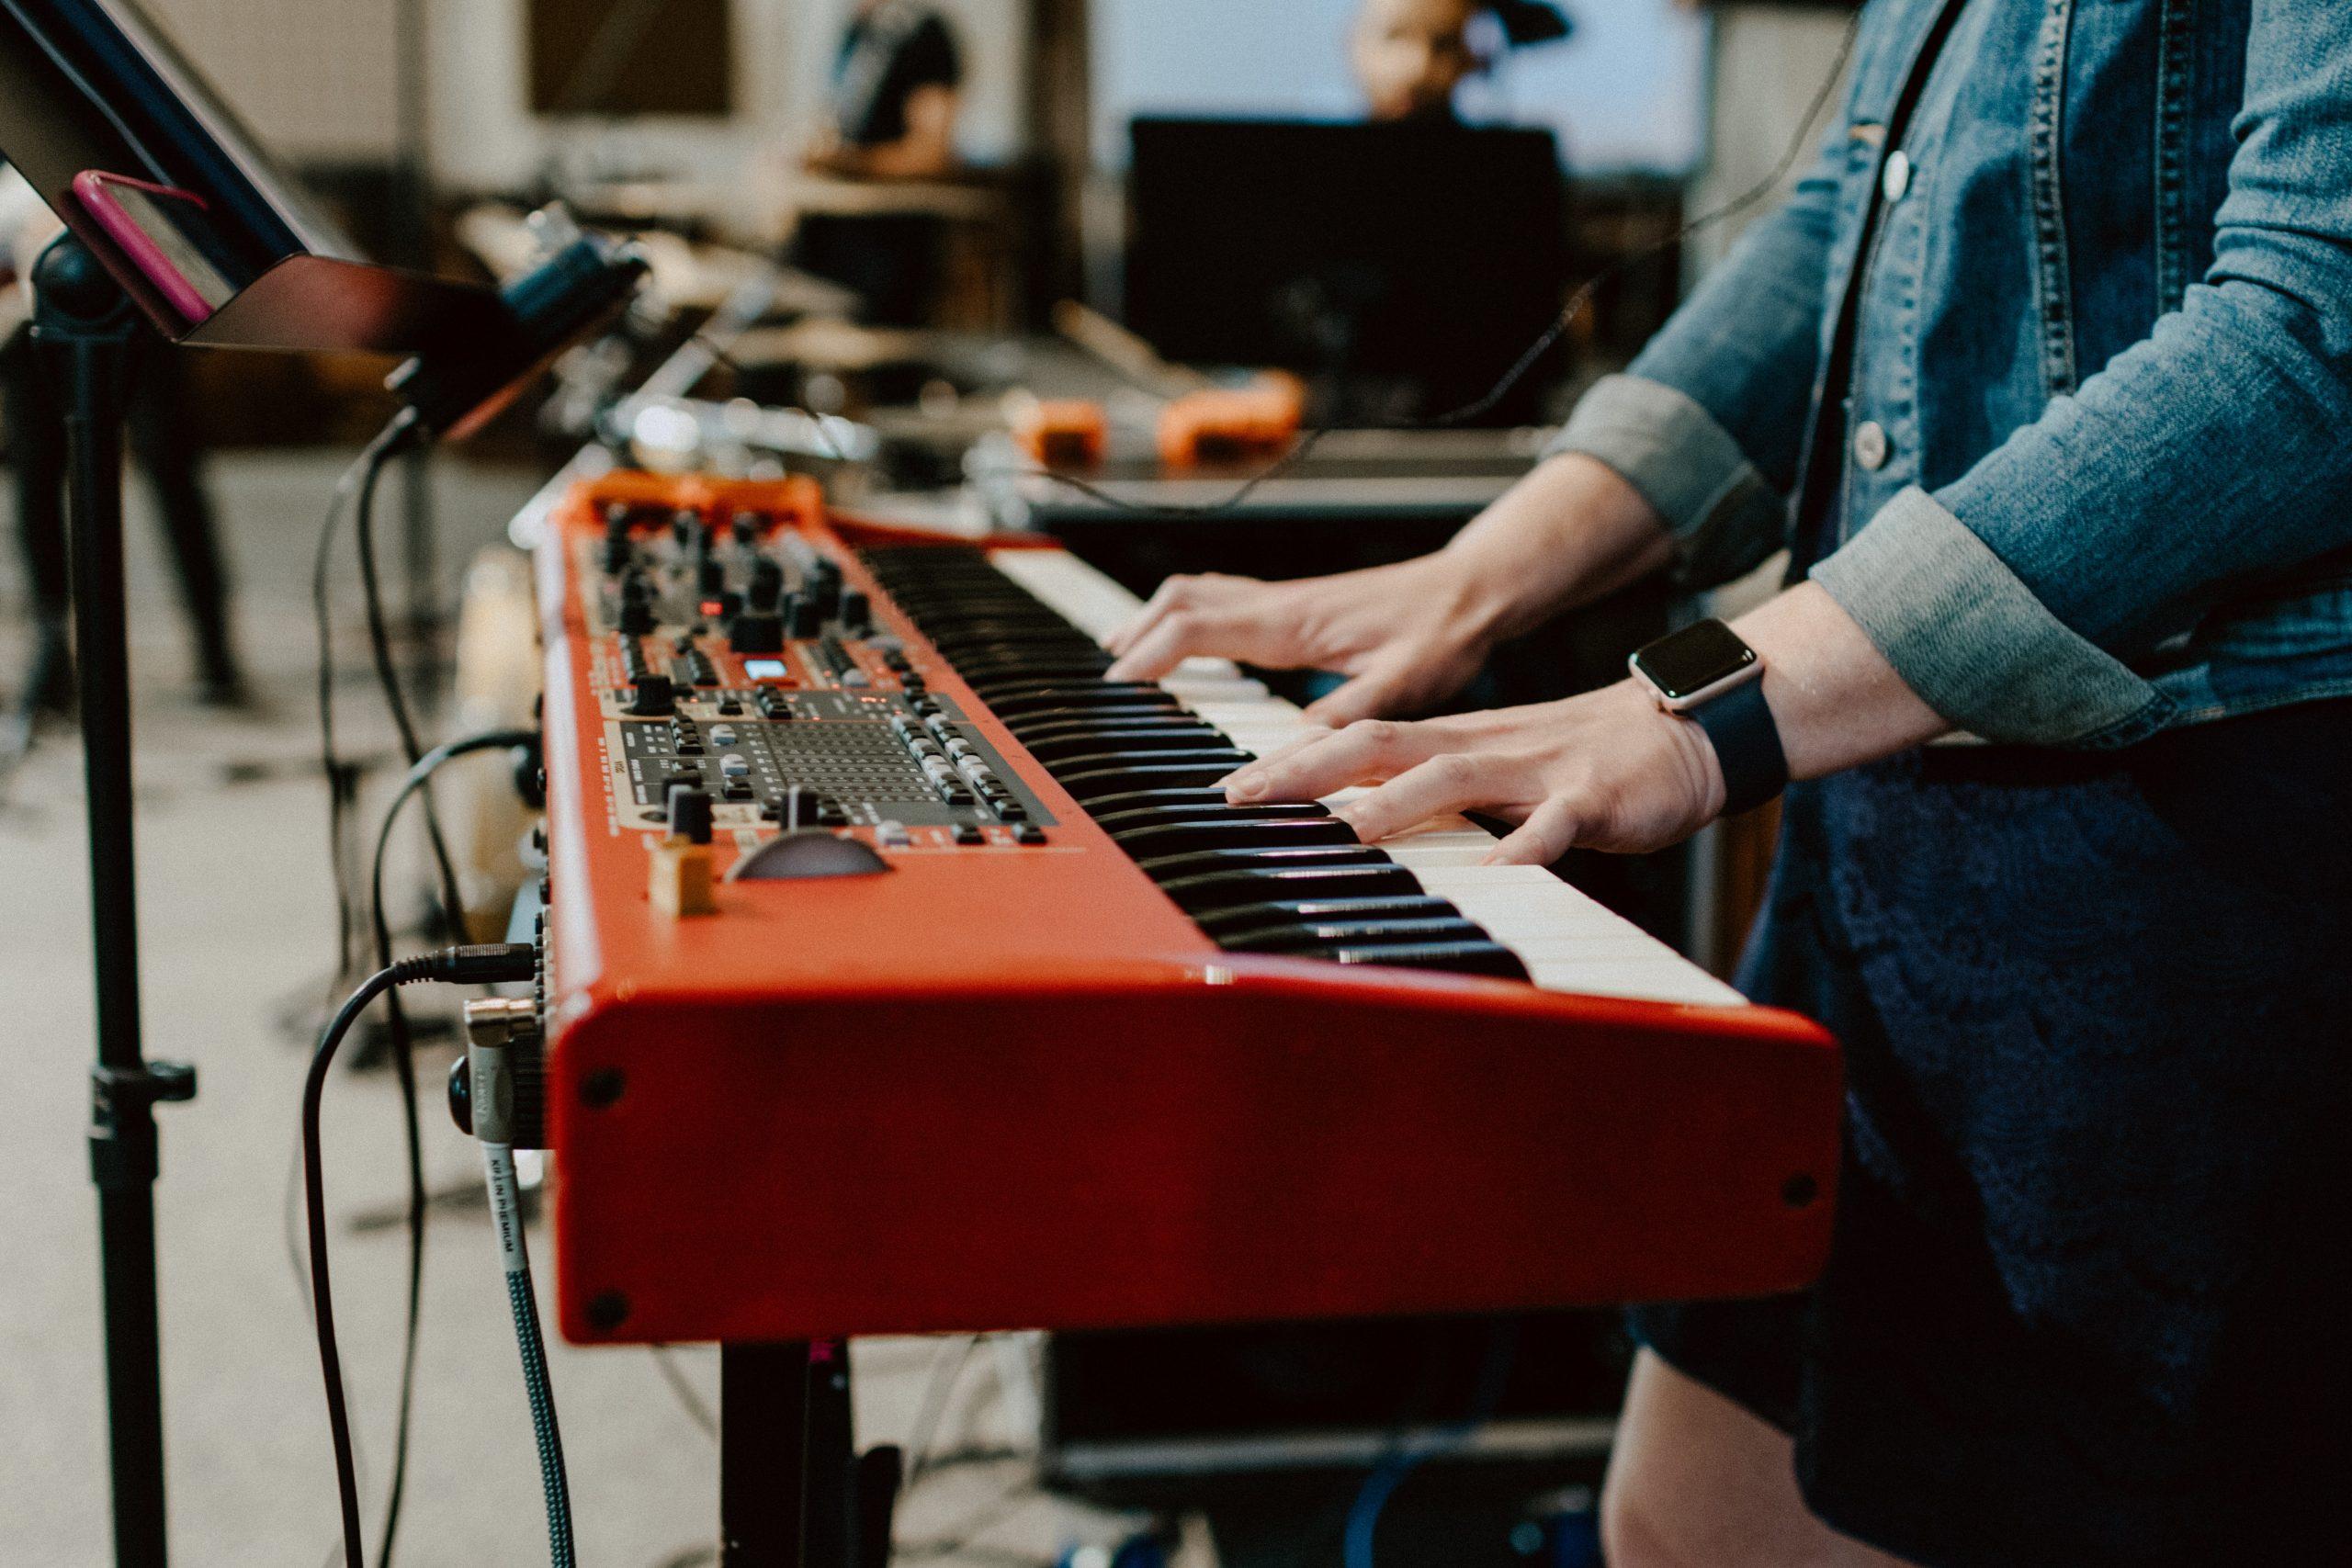 piano electrico rojo